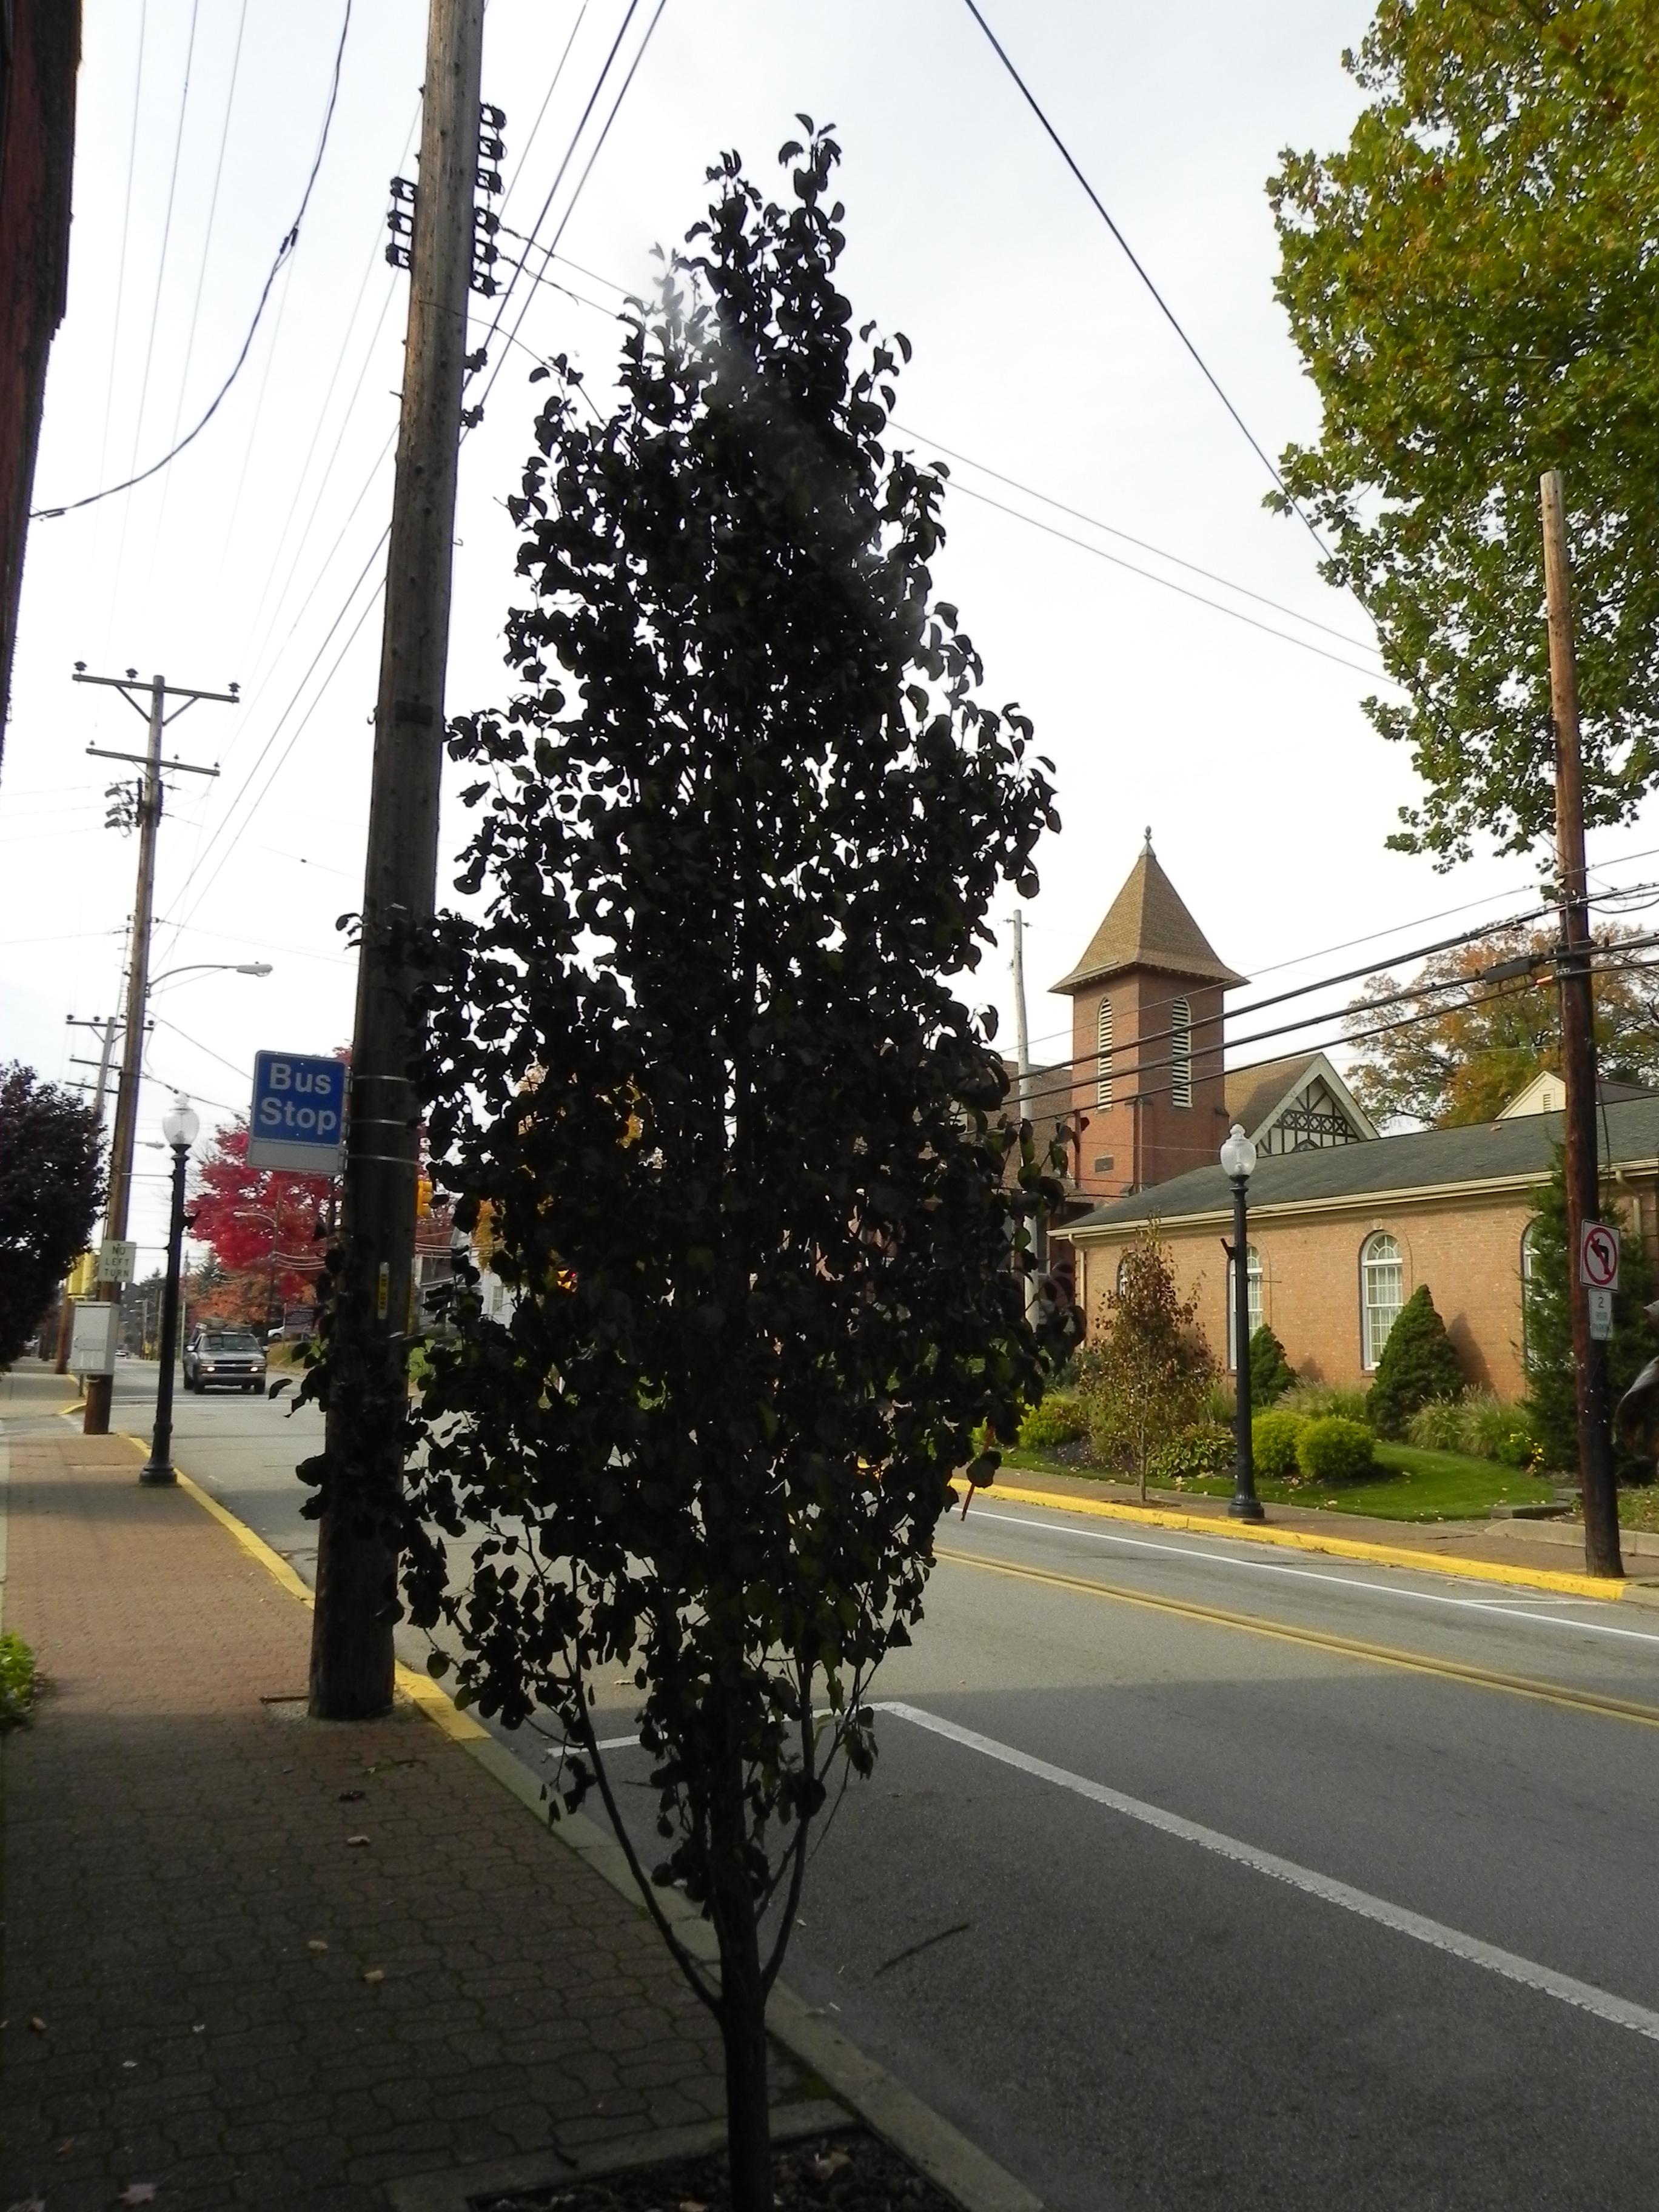 Tree sponsored by STAR